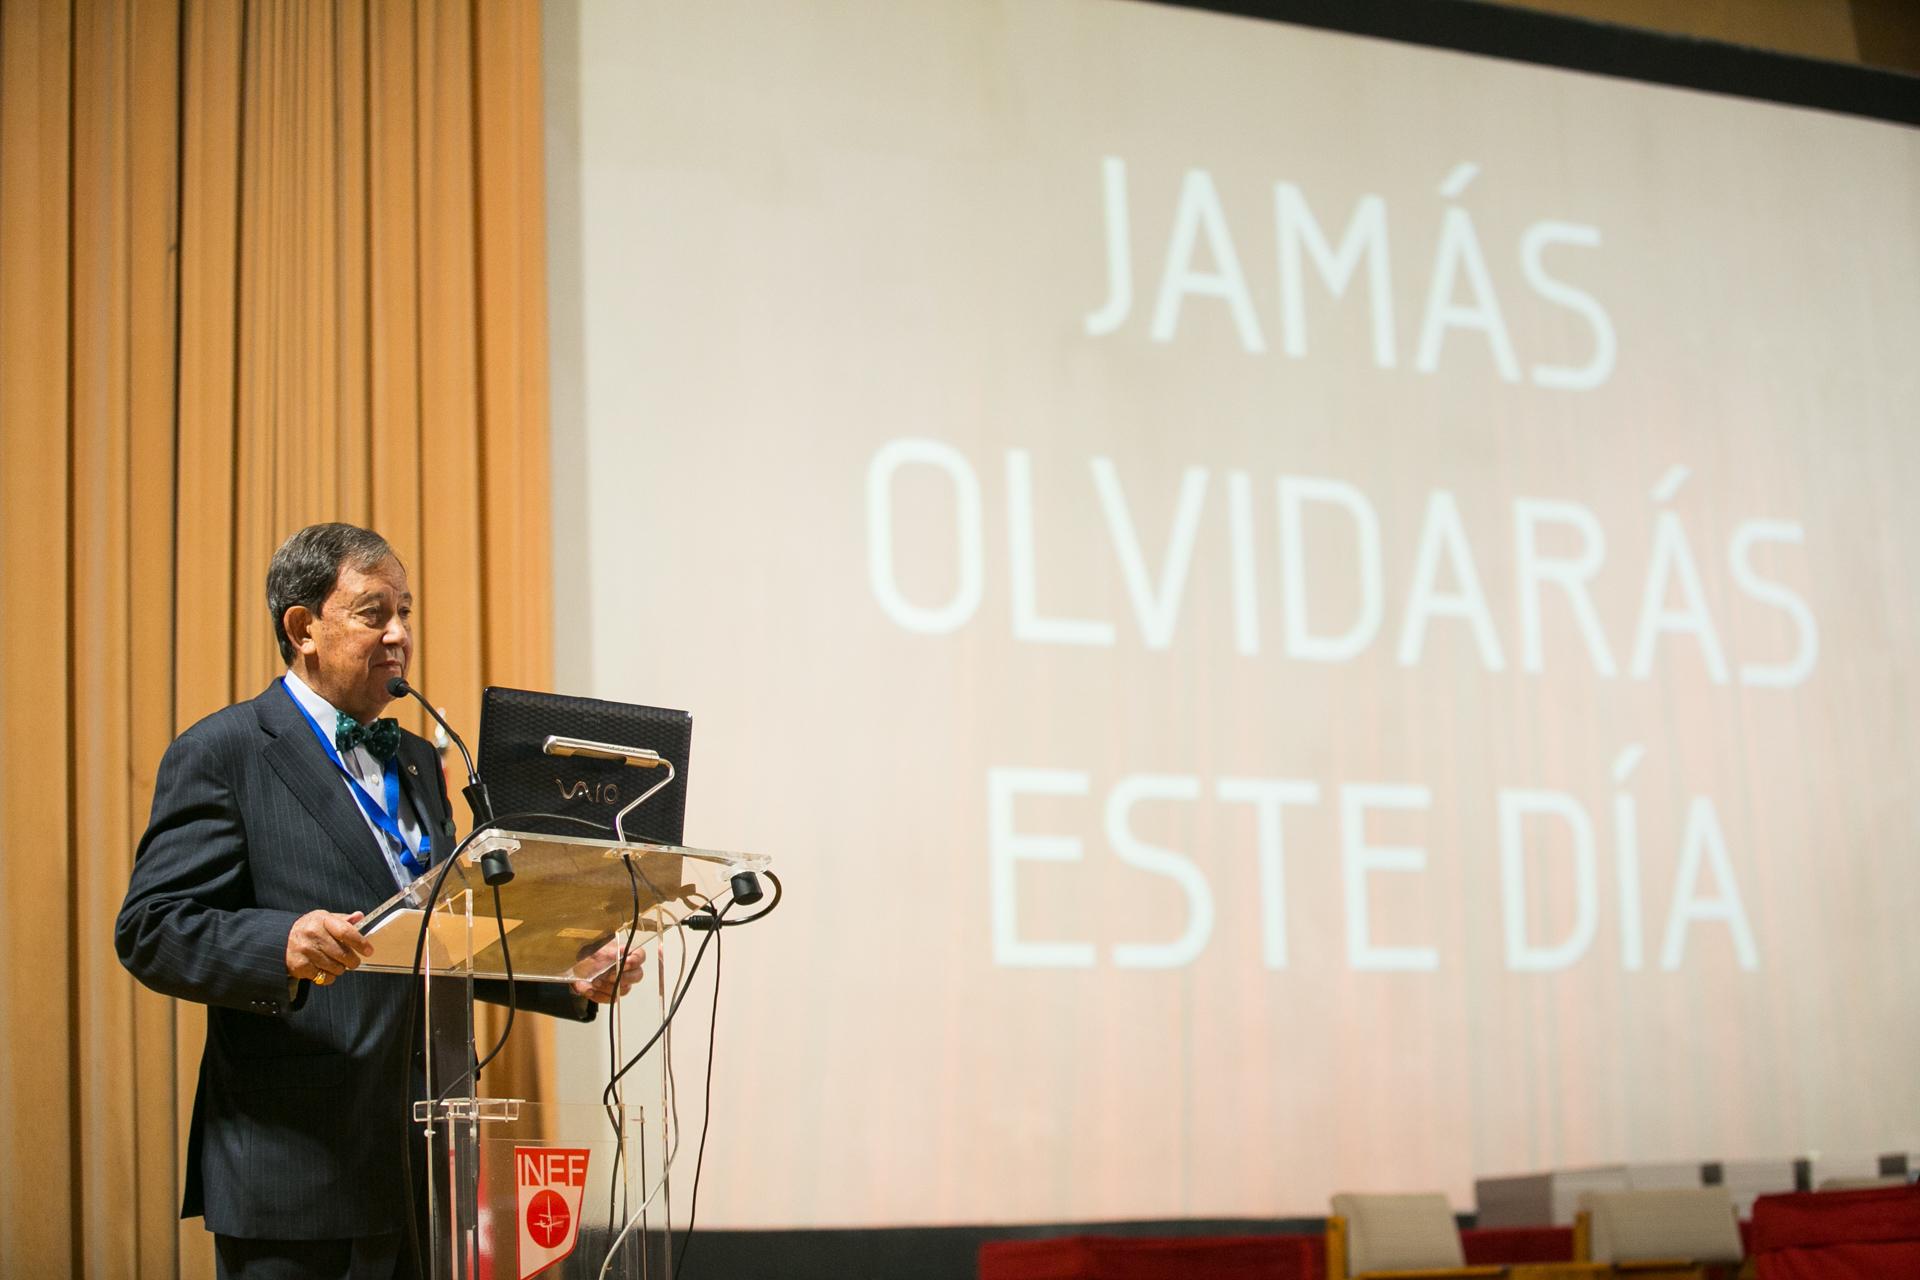 Intervención de Juan Ángel Gato. Presidente AEP.